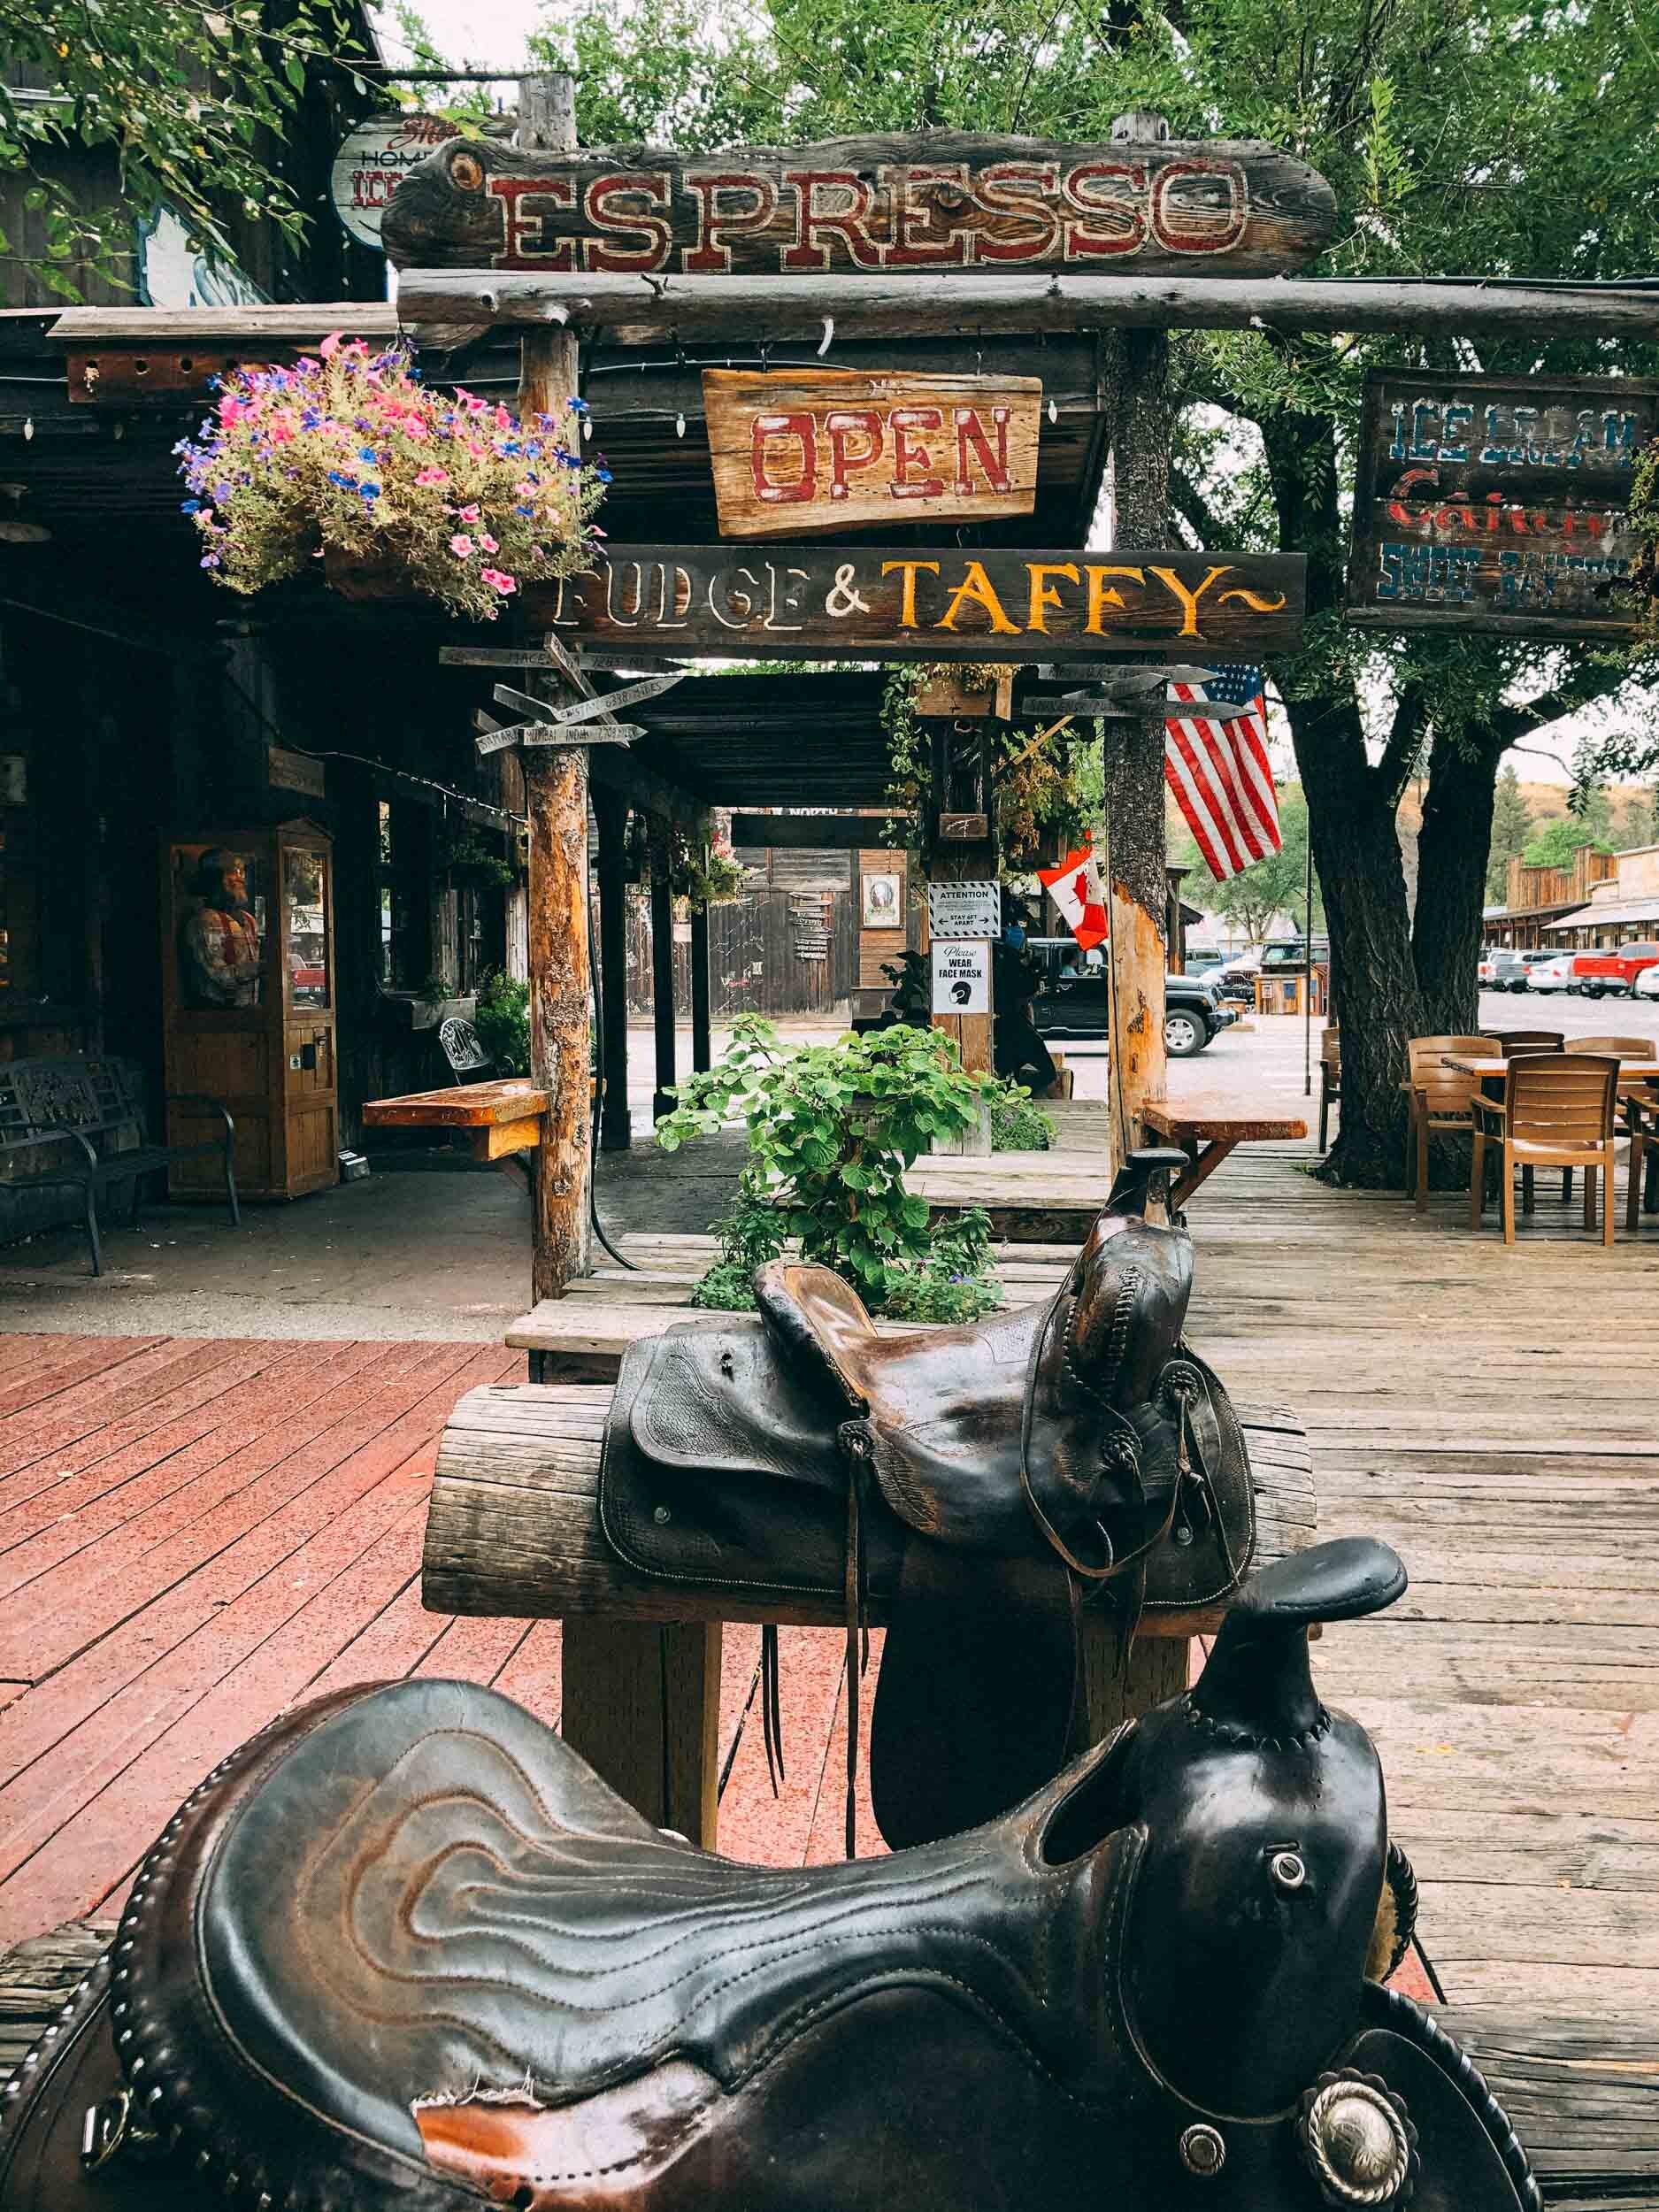 Winthrop's main street features a fun western theme.